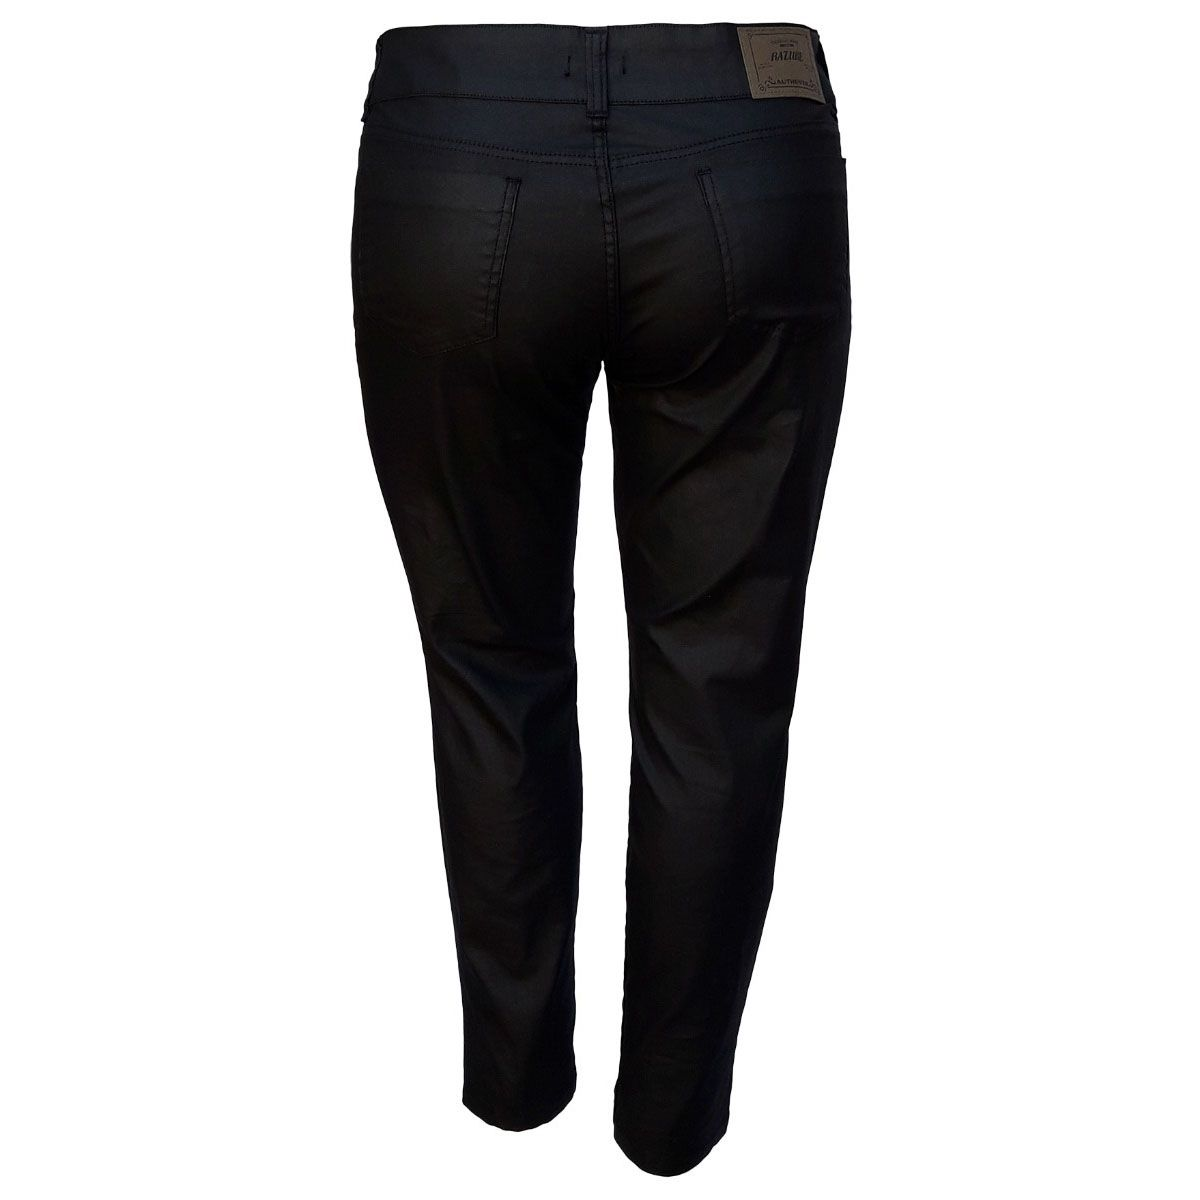 Calça Jeans Feminina Skinny Resinada Plus Size